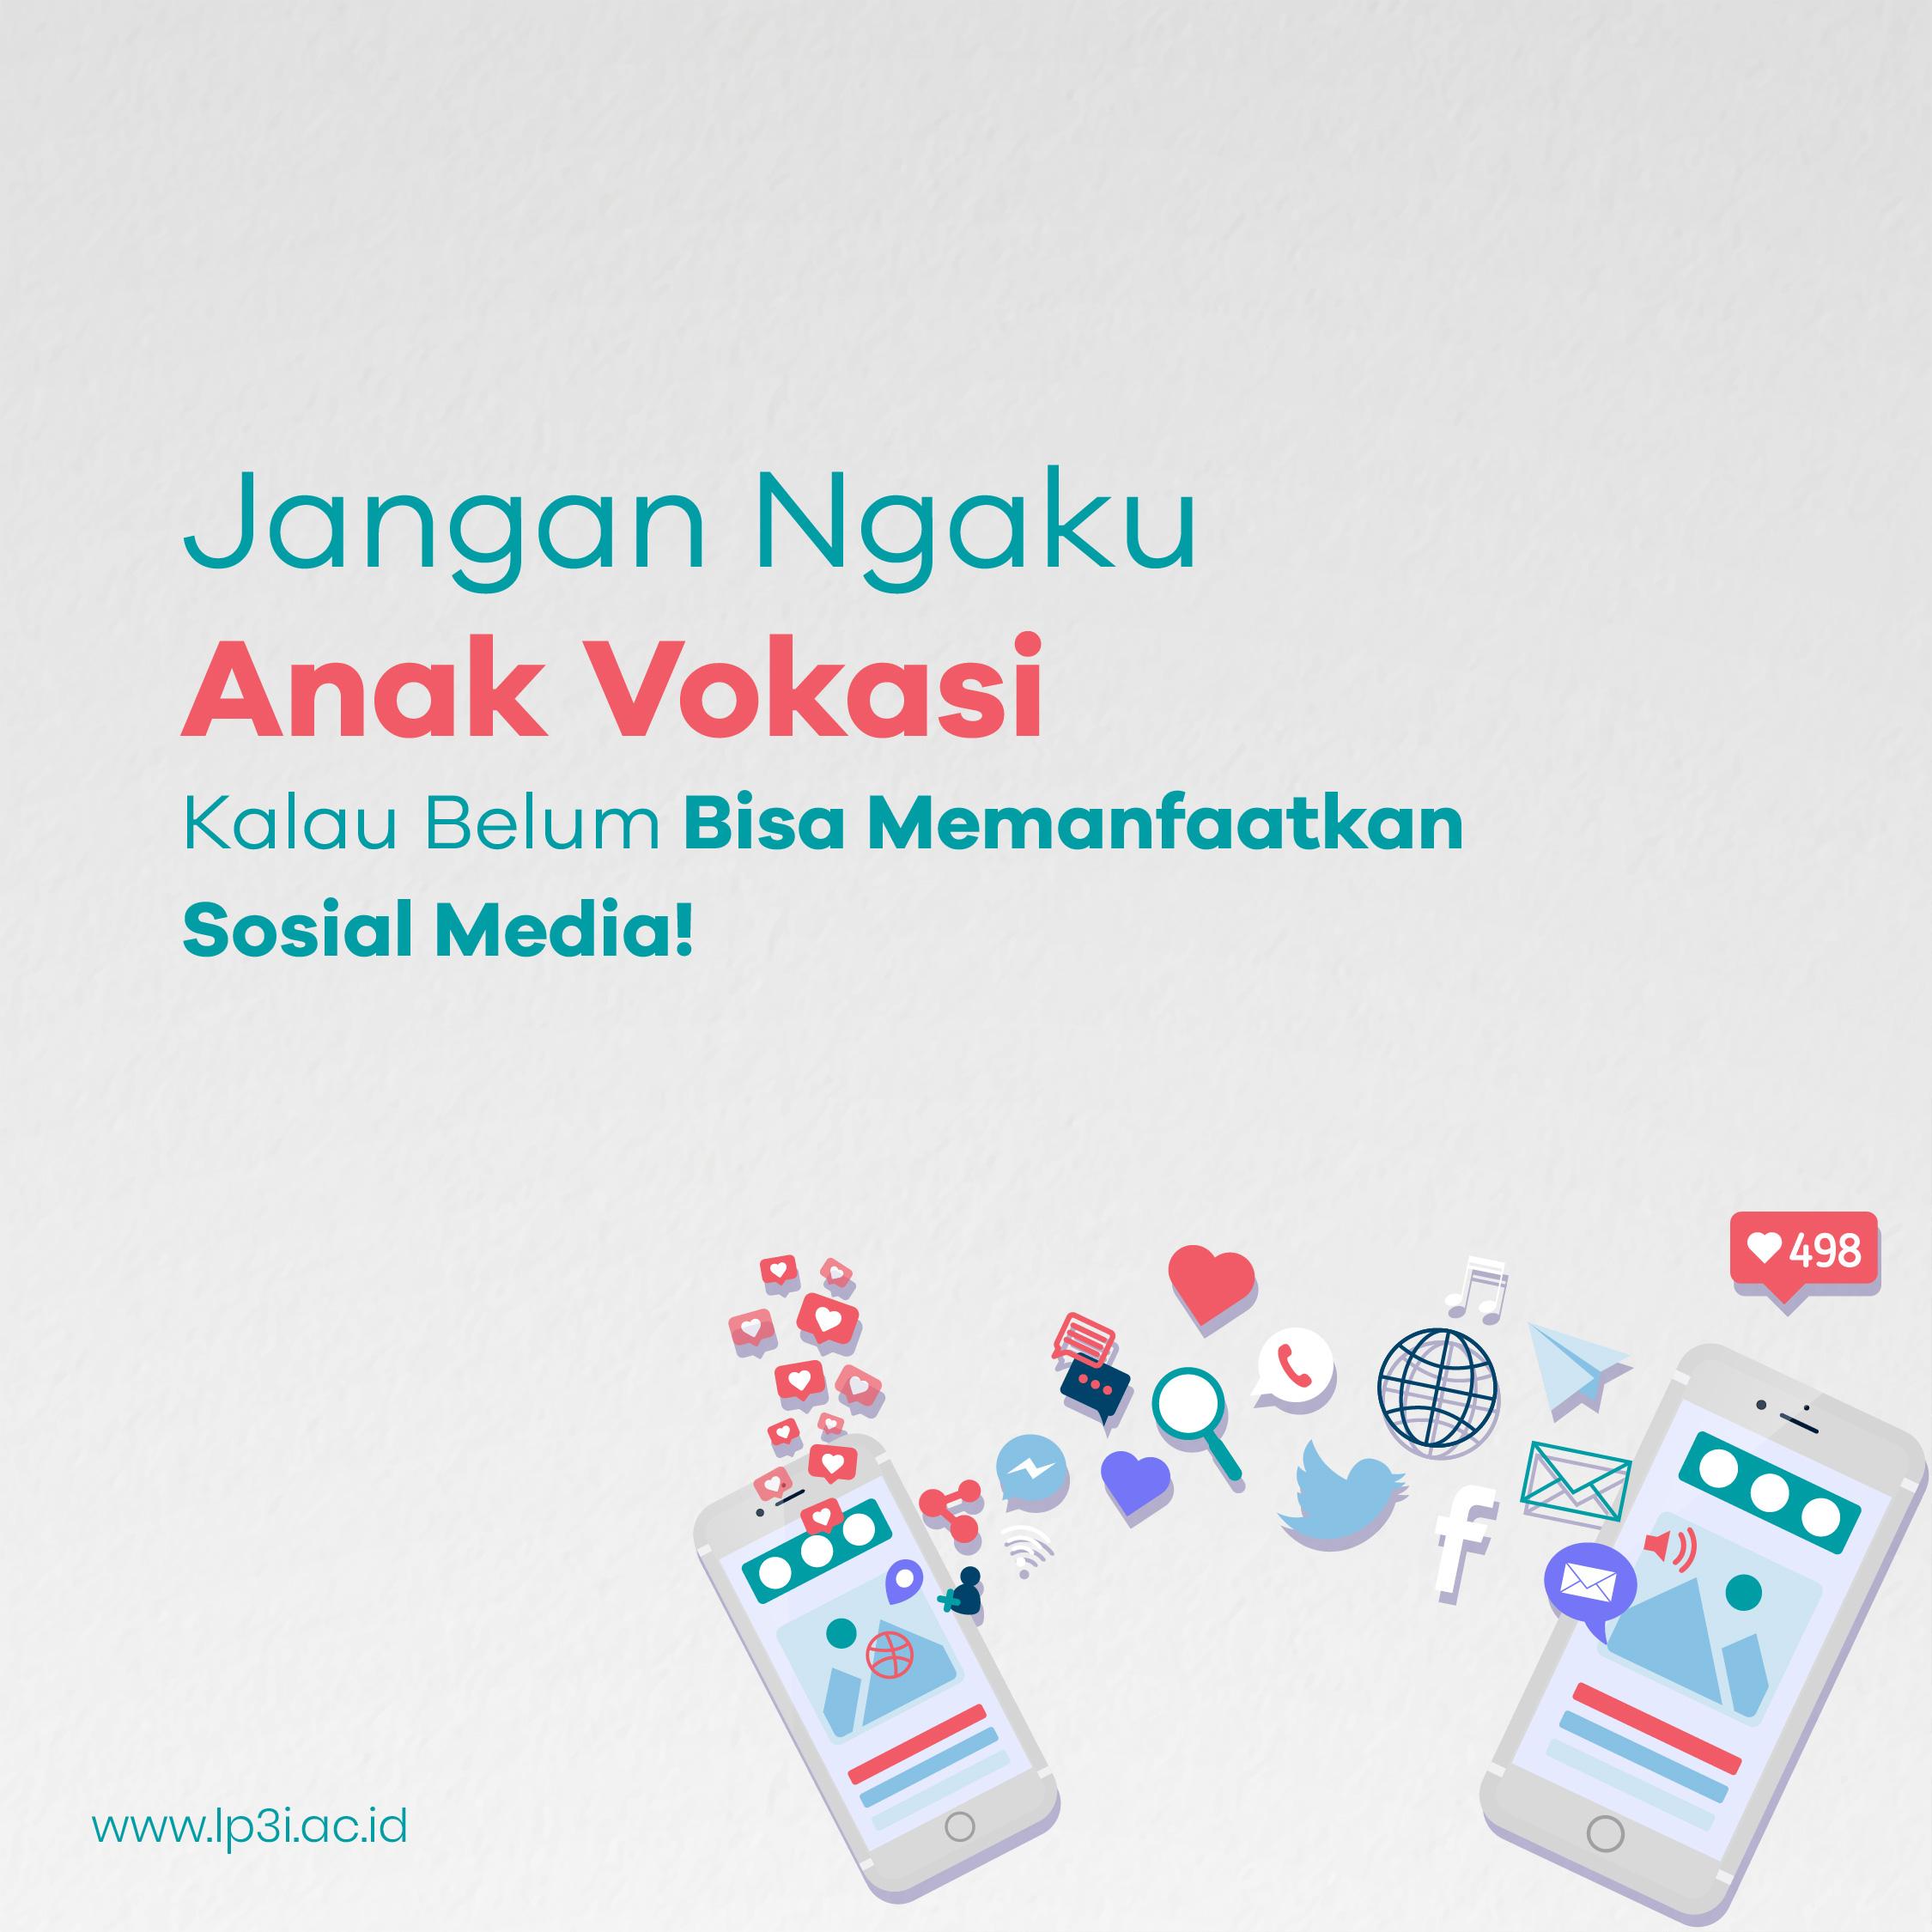 Jangan Ngaku Anak Vokasi Kalau Belum Memanfaatkan Sosial Media!